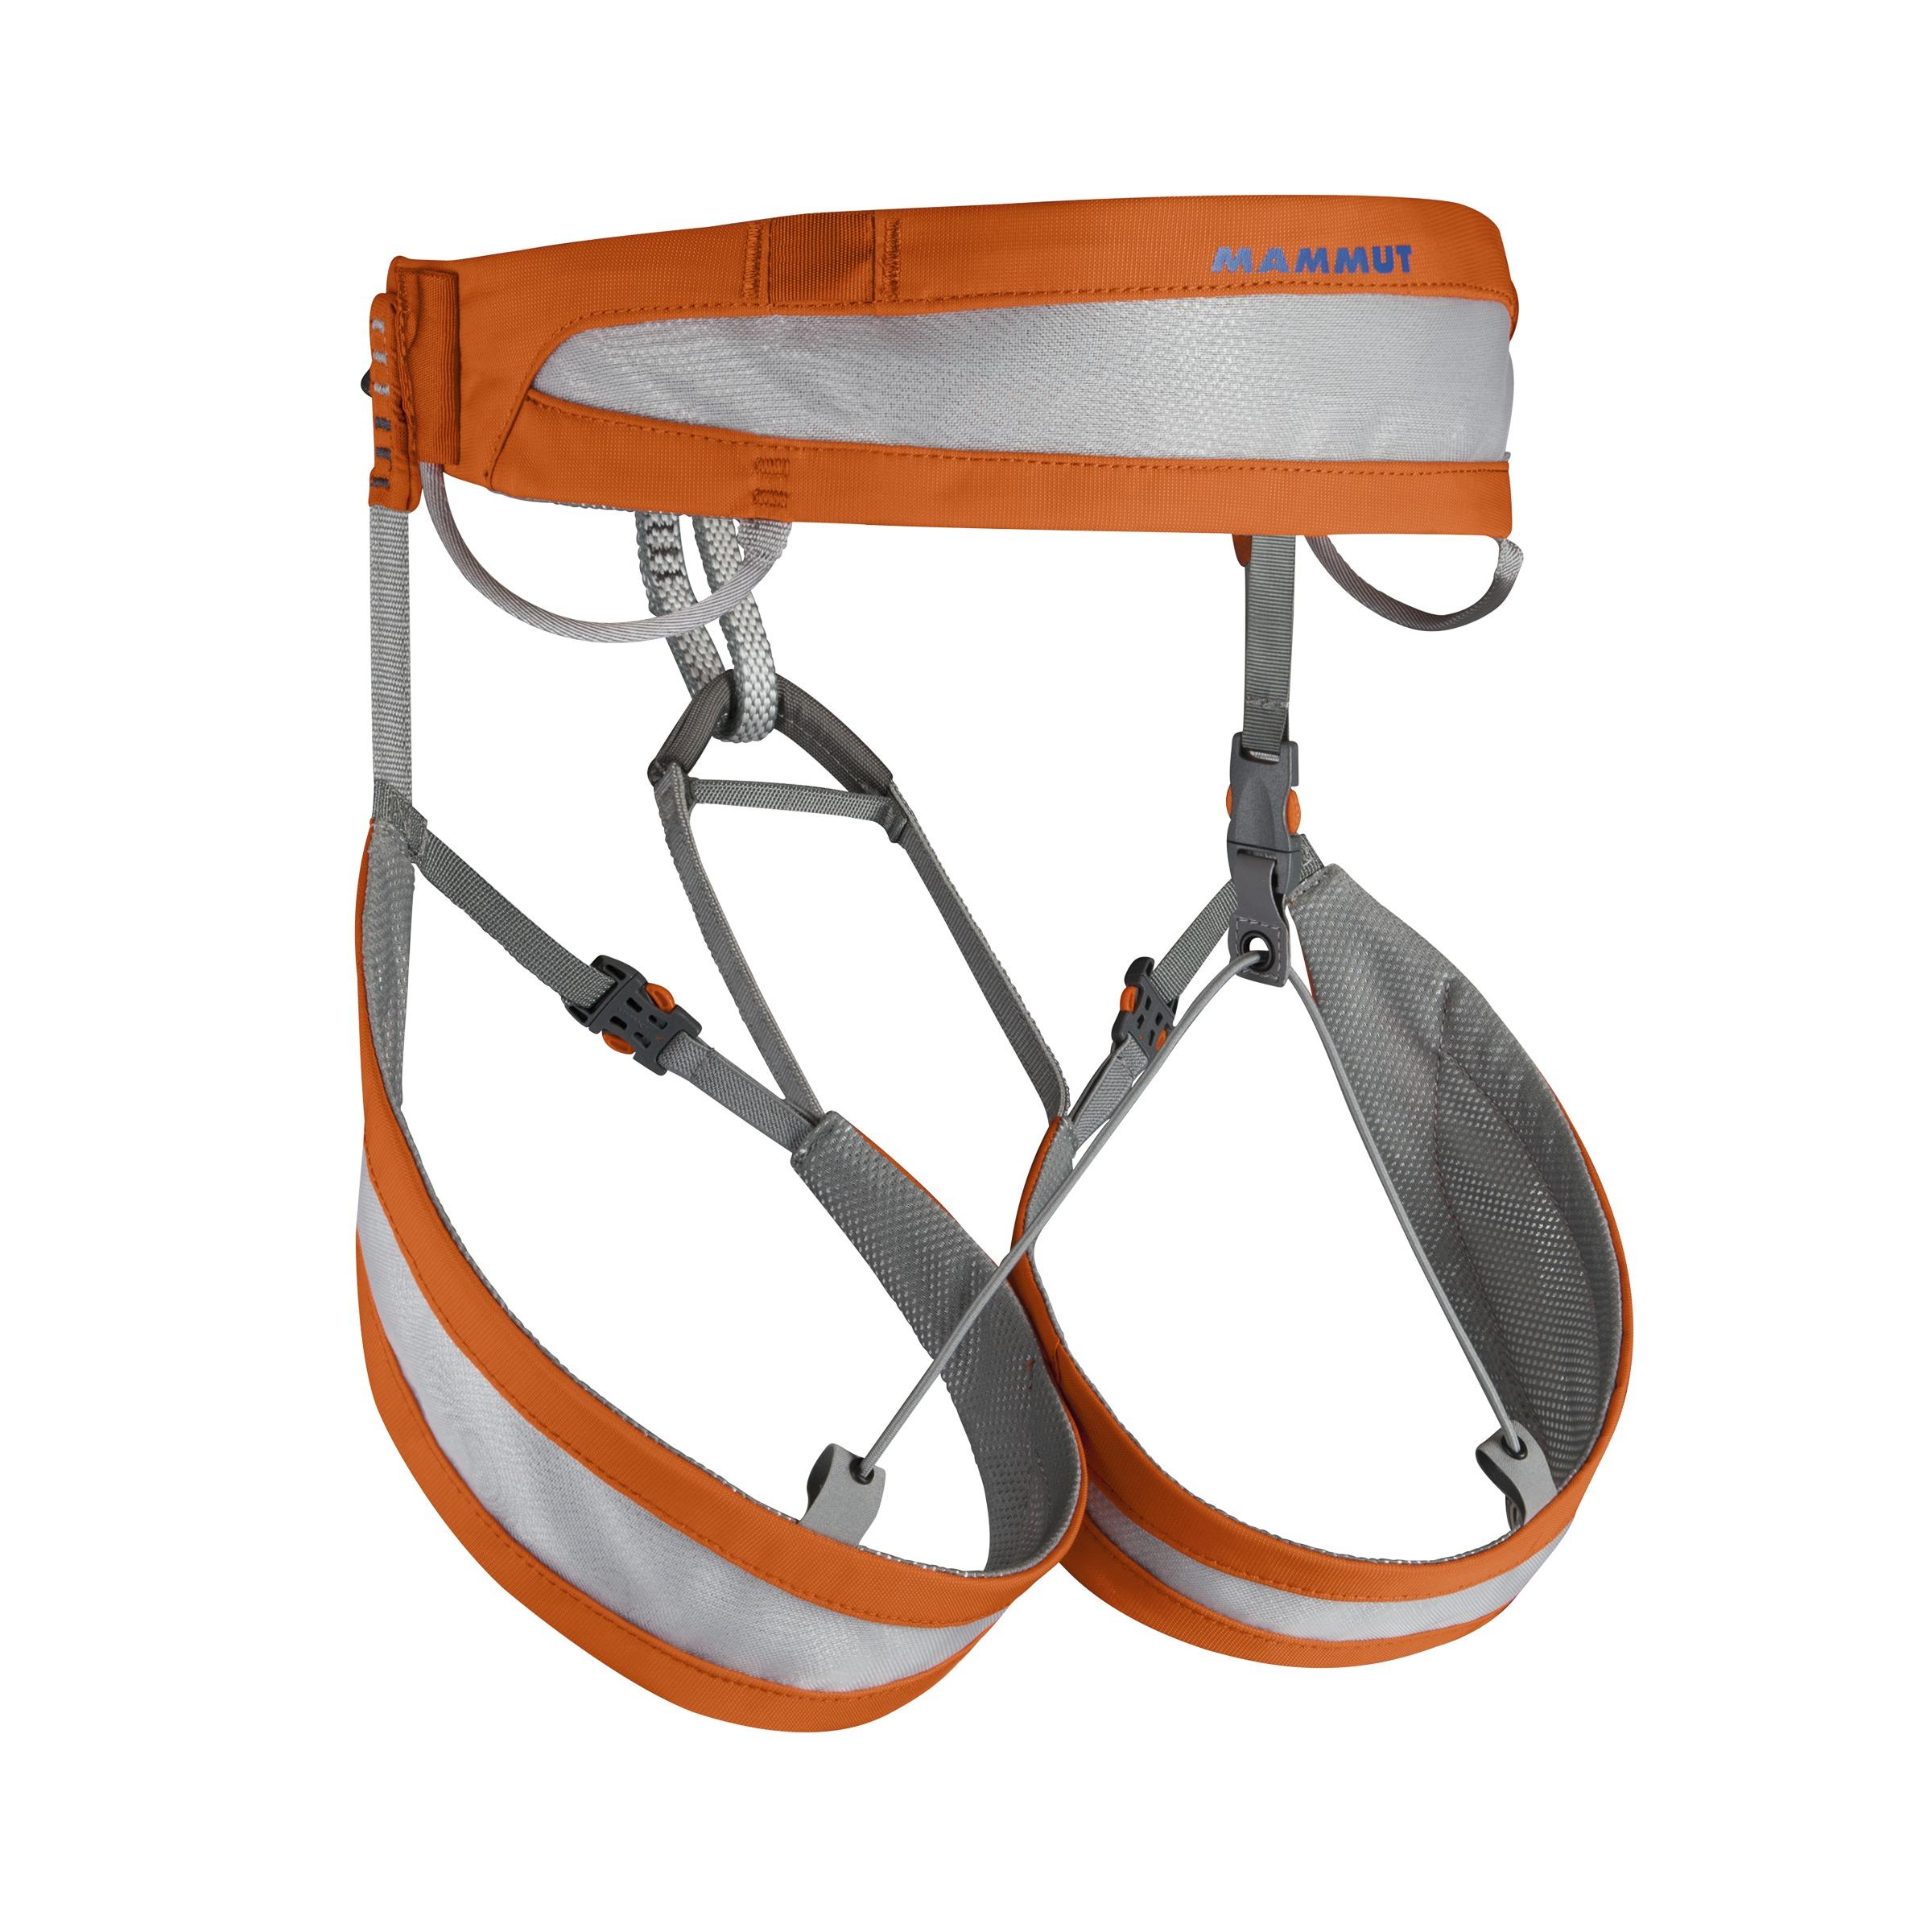 Sam Shaheen reviews the Mammut Zephir Altitude harness for Blister Gear Review.